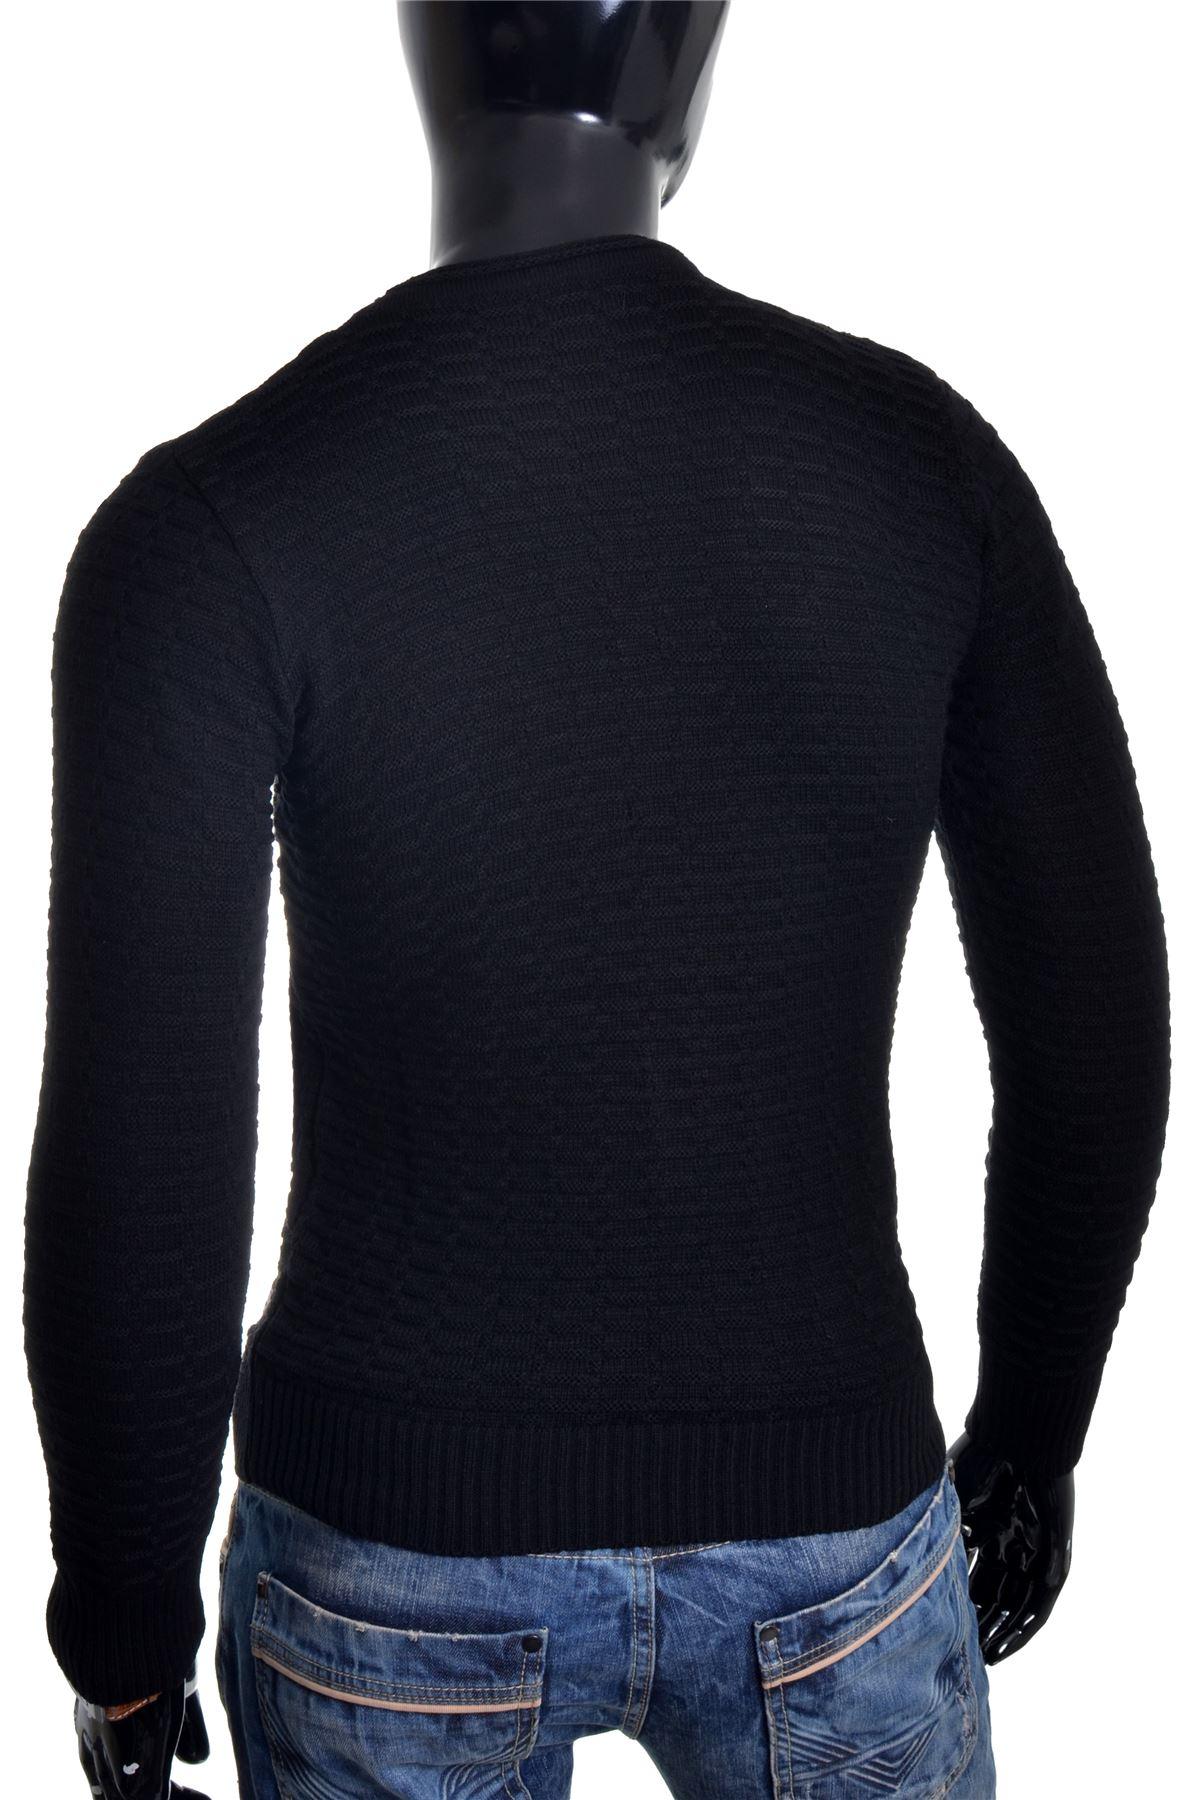 Men-039-s-Jumper-Striped-Knit-Smart-Long-Sleeve-Sweater-Crew-Neck-Top-Slim-Fitness thumbnail 11